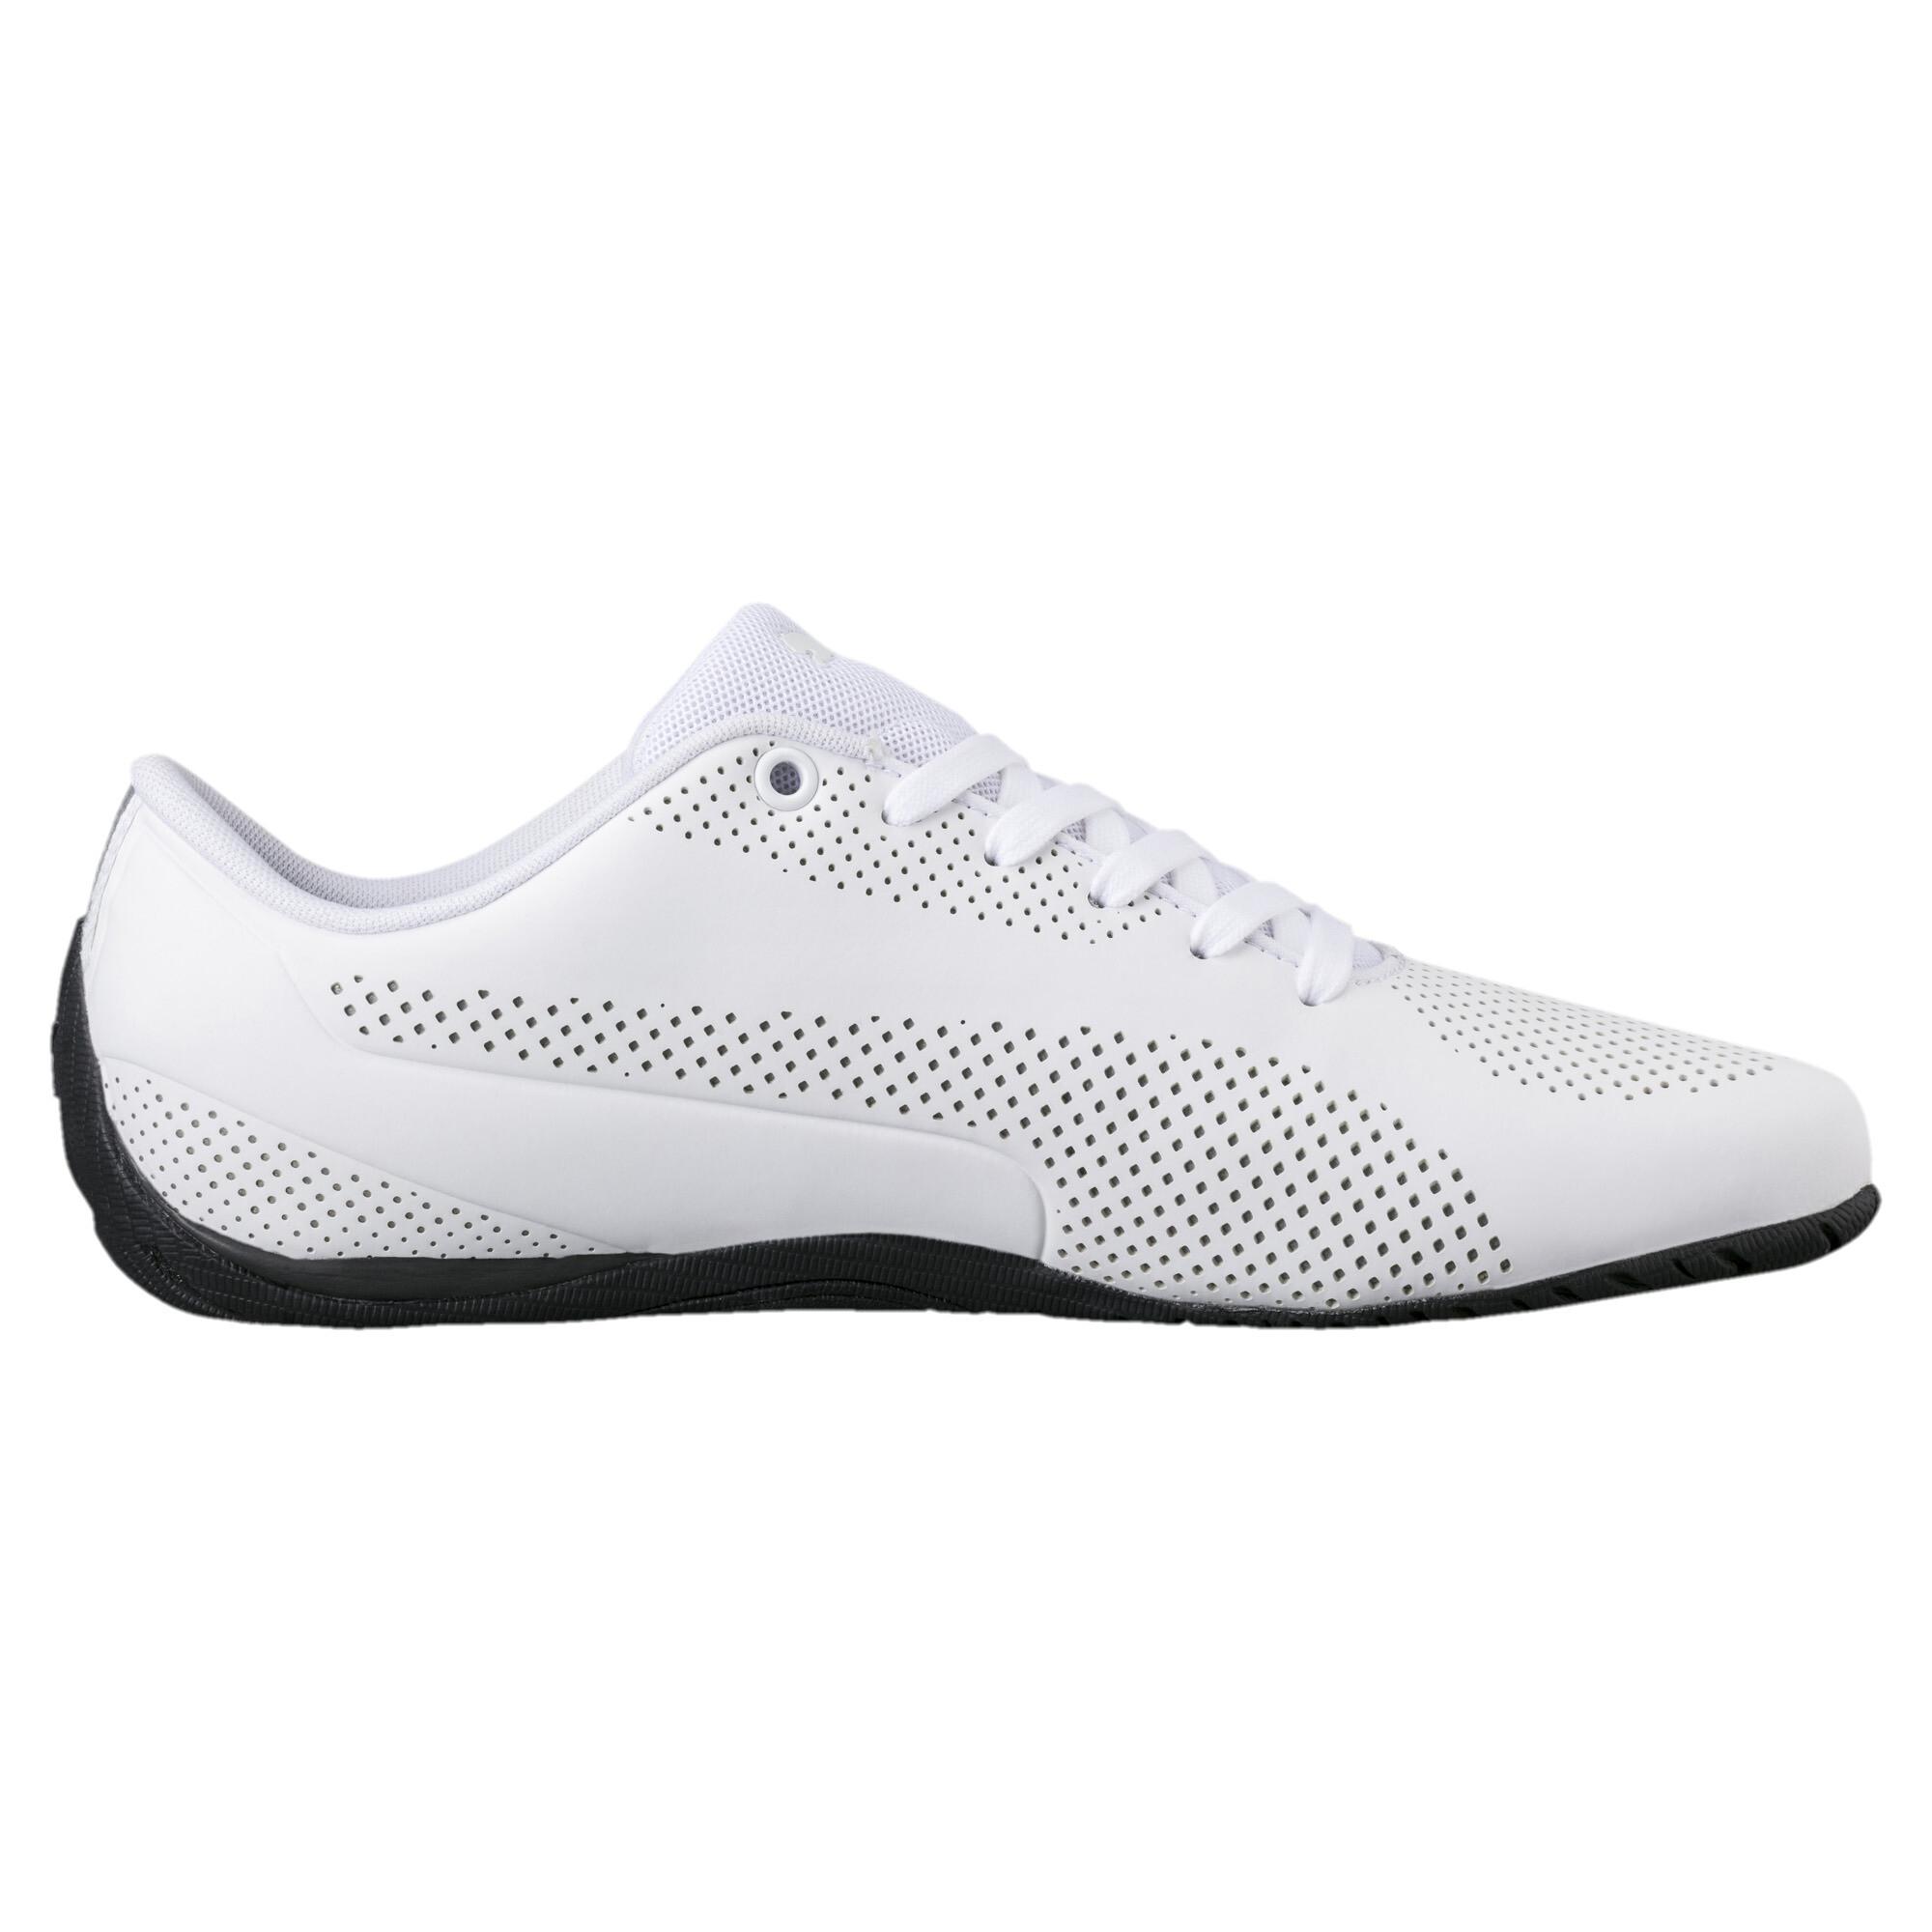 PUMA-Drift-Cat-Ultra-Reflective-Men-039-s-Shoes-Men-Shoe-Sport-Classics thumbnail 8